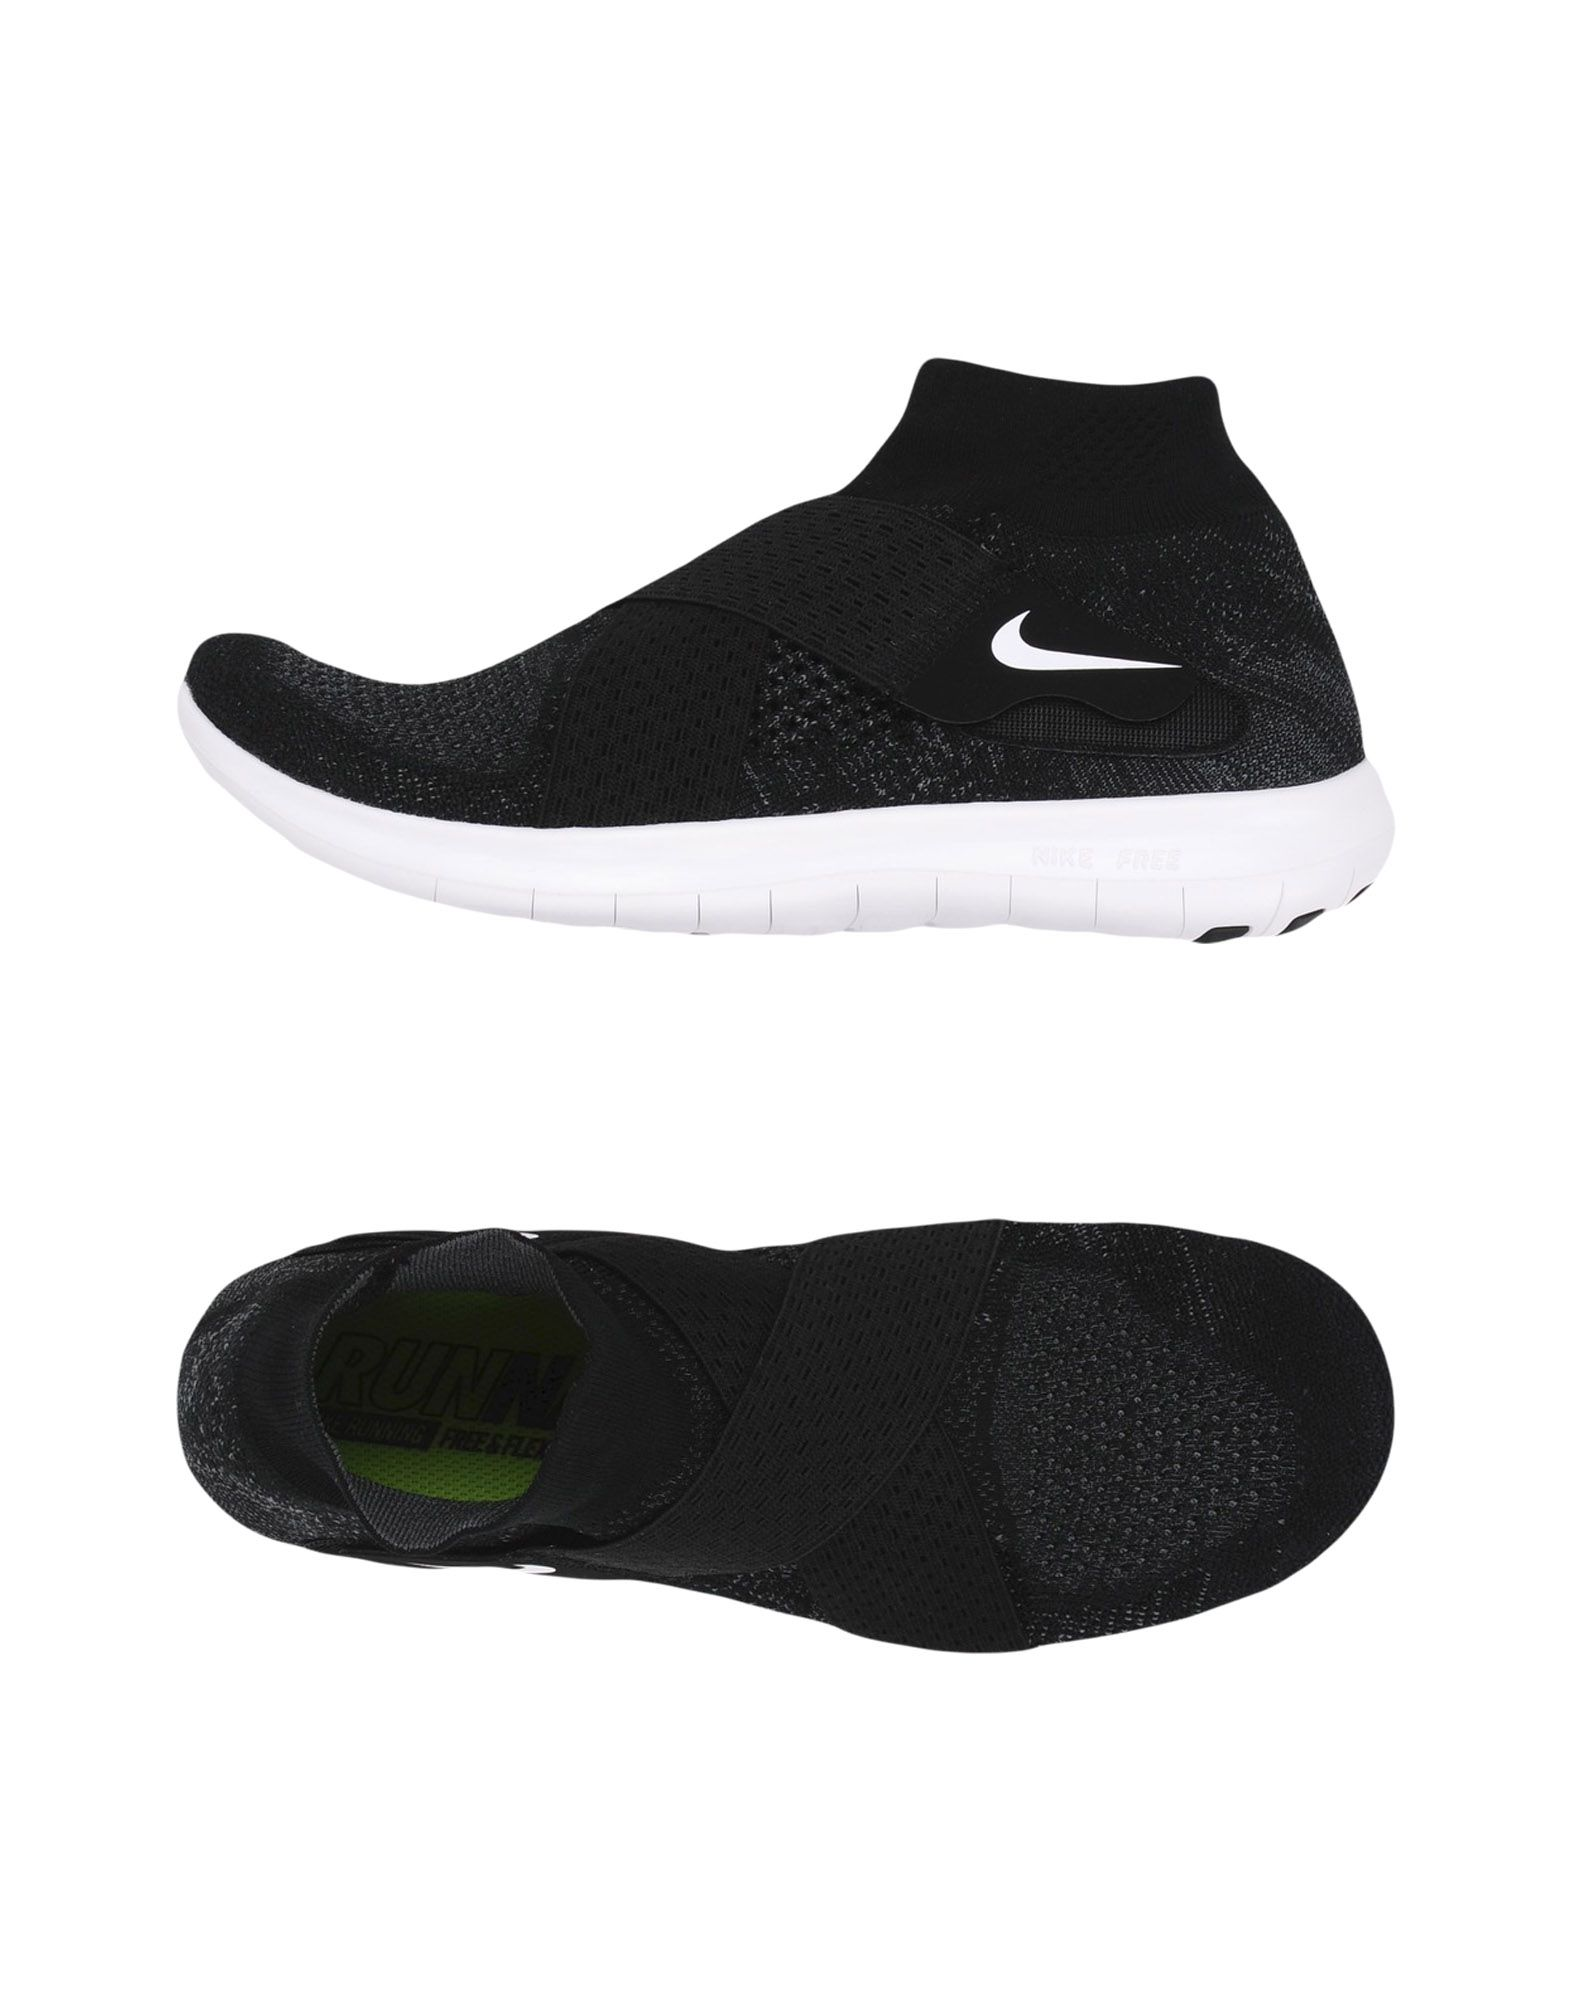 Nike   Free Run Motion Fk 2017  11431339VI